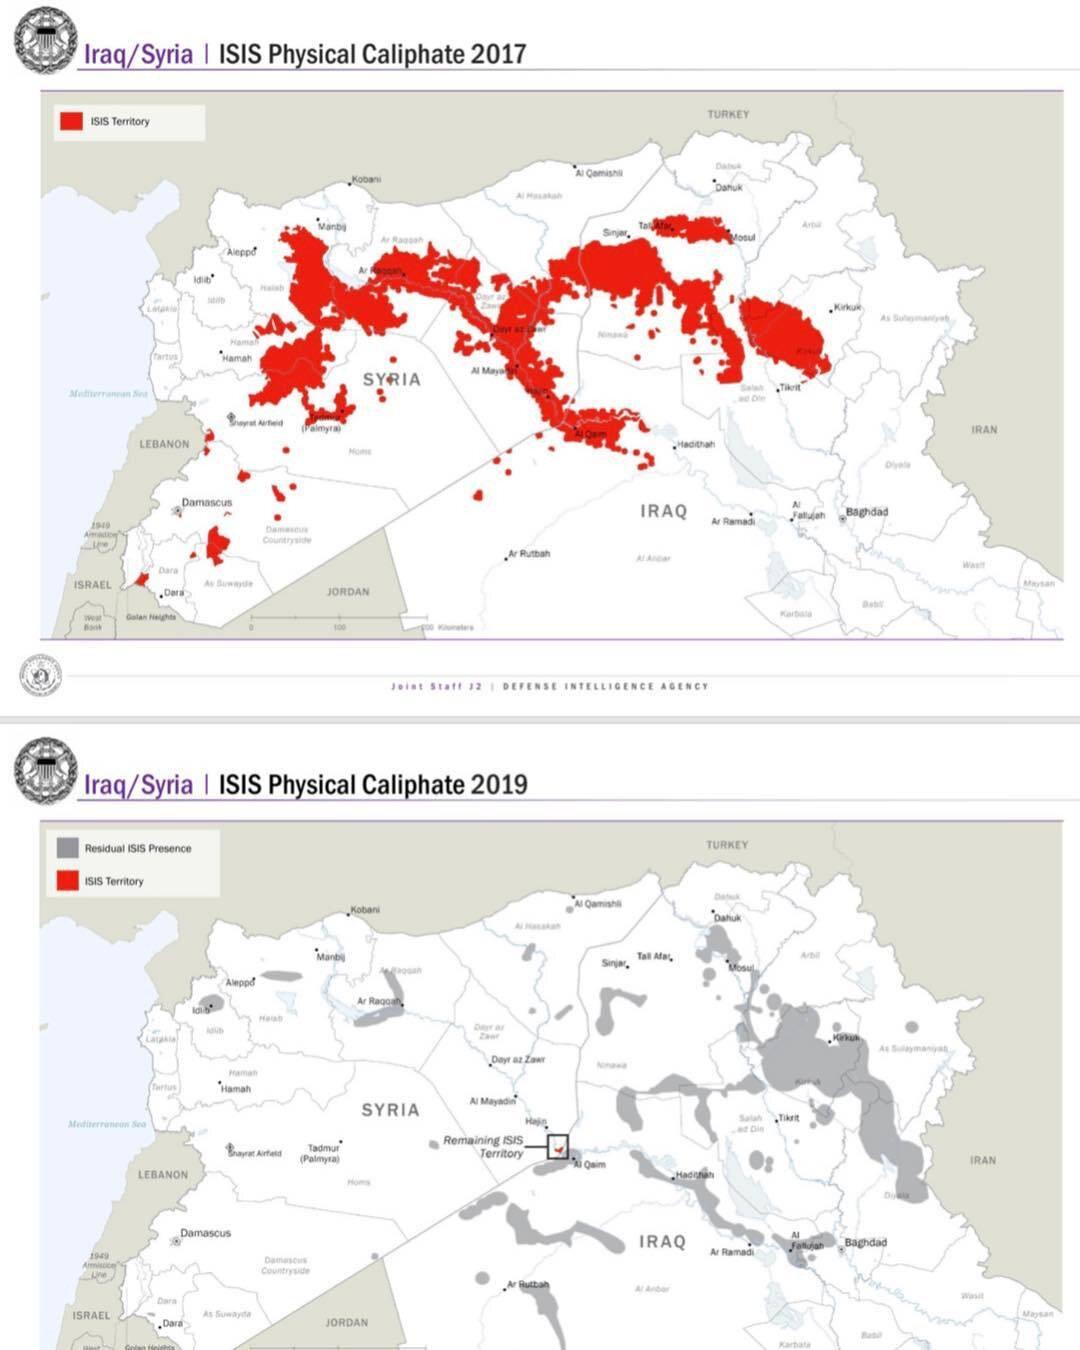 ISIS 2017 vs 2019